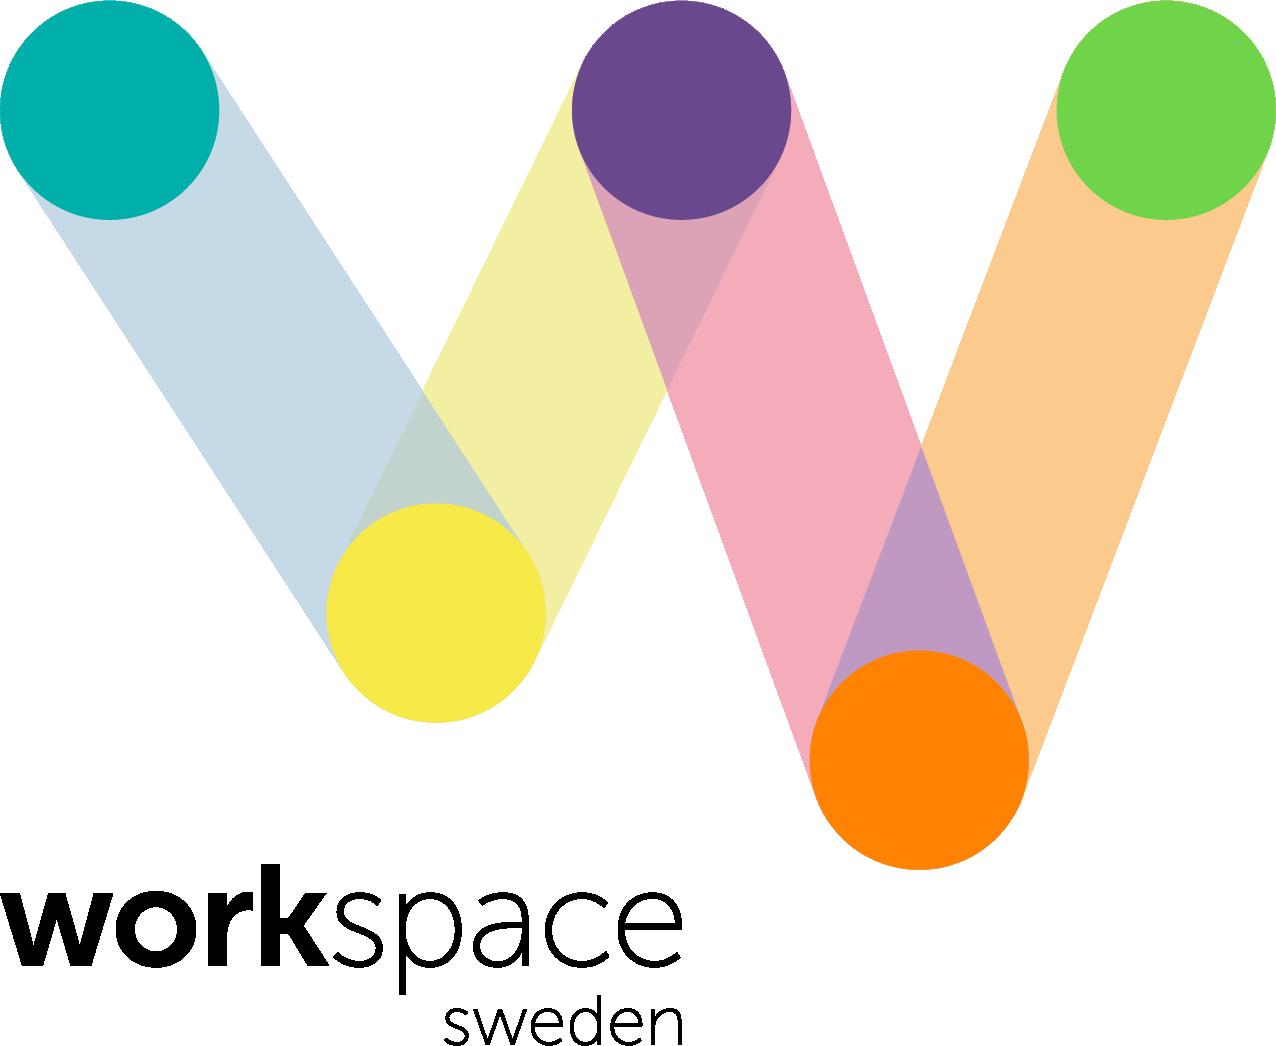 workspacesweden_logo